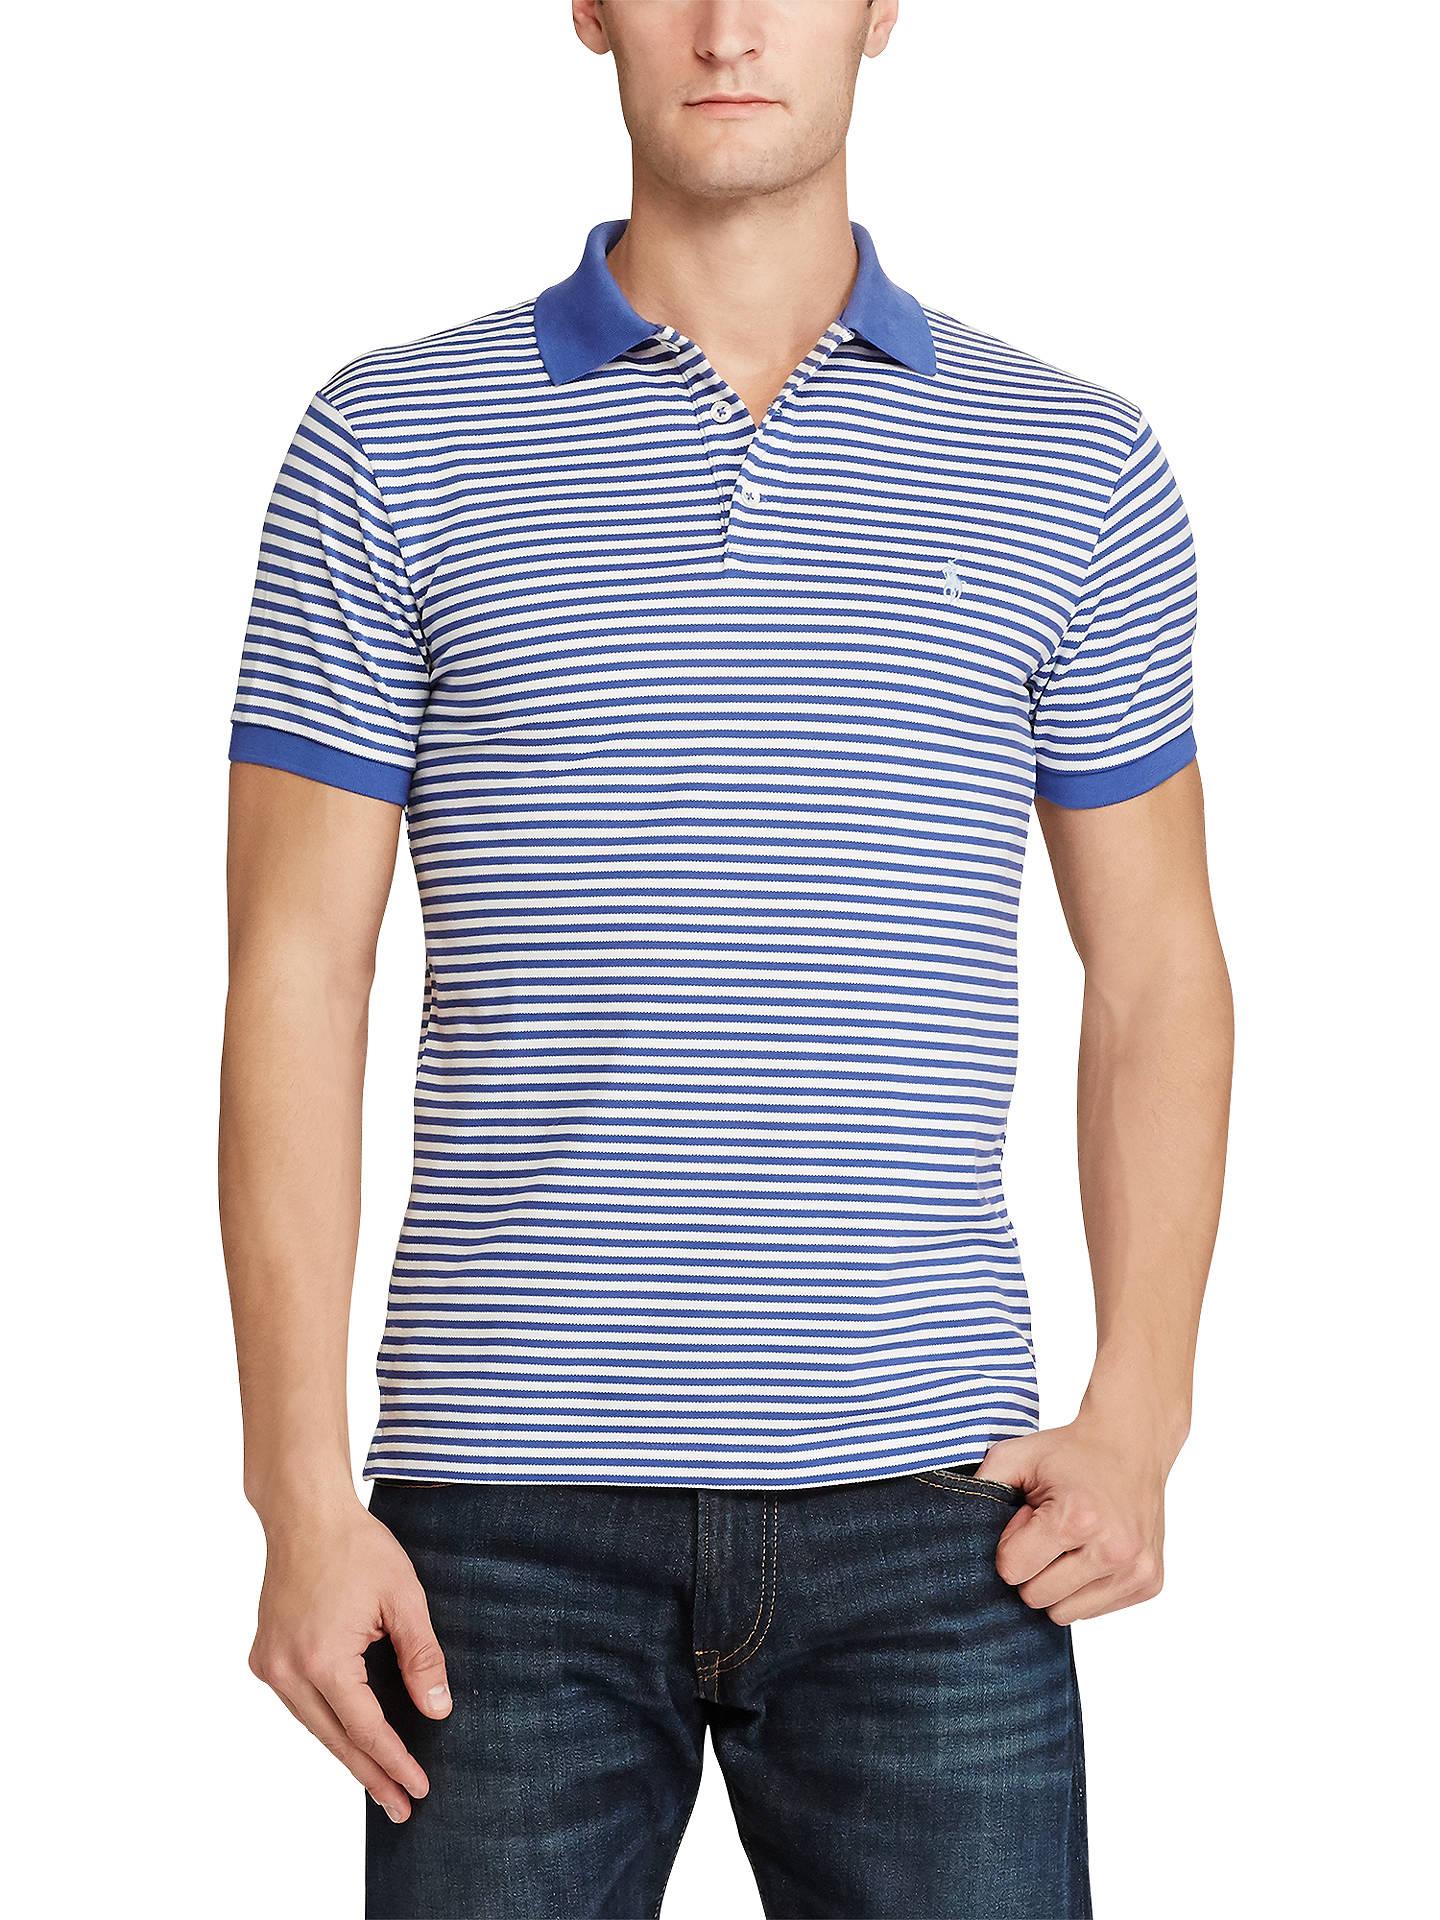 9bc0840f9 Polo Ralph Lauren Striped Slim Fit Stretch Cotton Mesh Polo Shirt ...